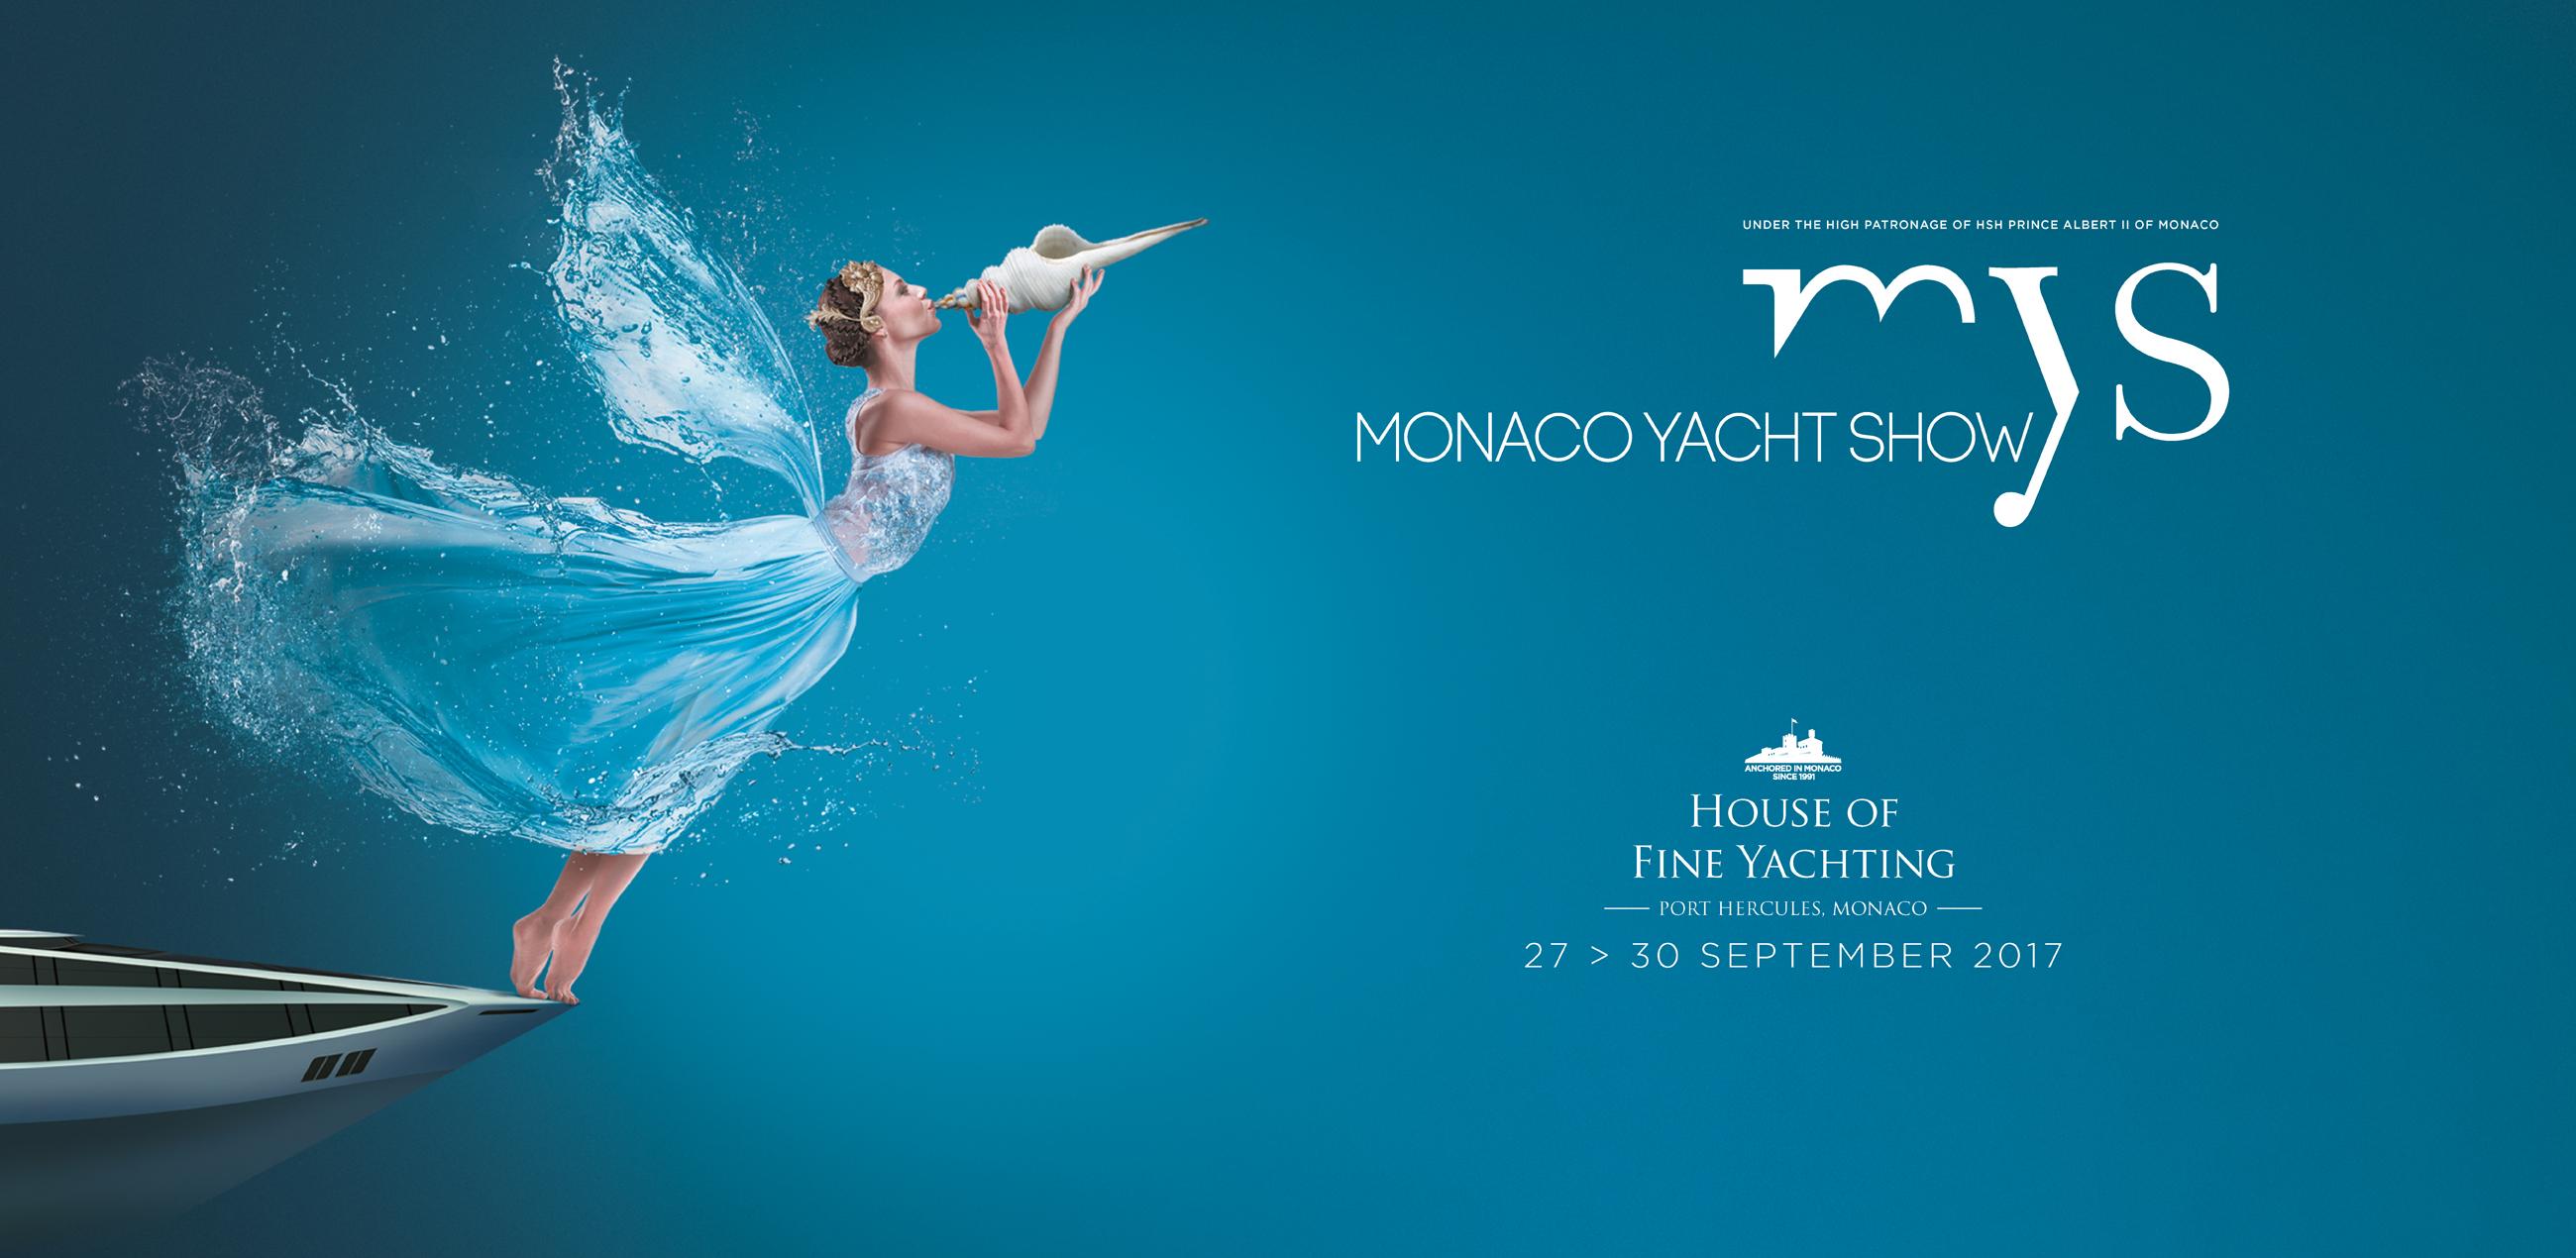 Монако Яхт Шоу MYS 2017